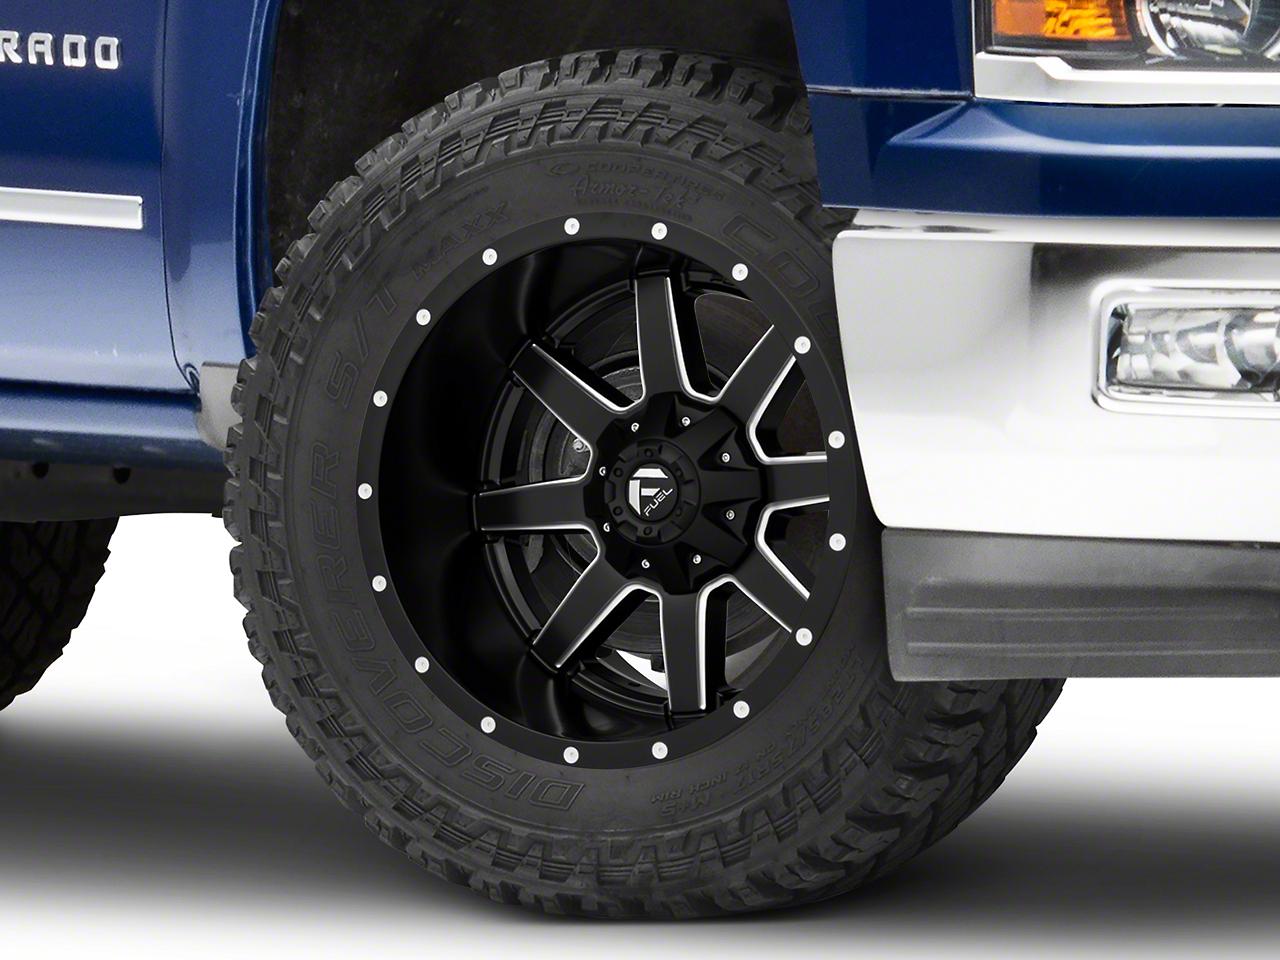 Fuel Wheels Maverick Black Milled 6-Lug Wheel - 20x12 (99-18 Silverado 1500)